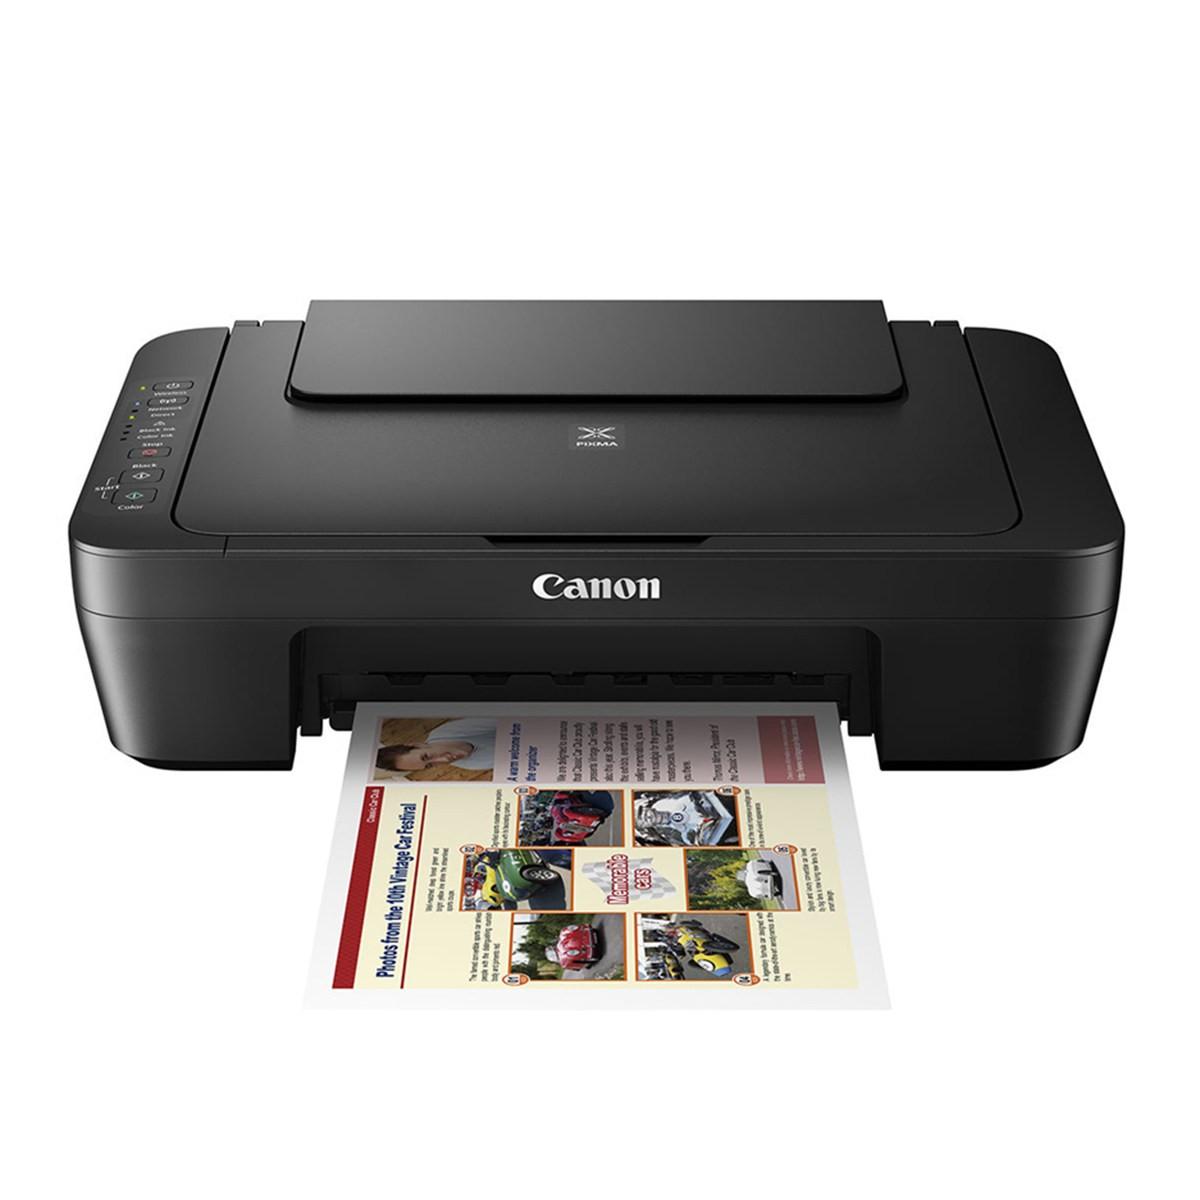 Impressora Canon Pixma MG3010 | Multifuncional Jato de Tinta com Conexão Wireless